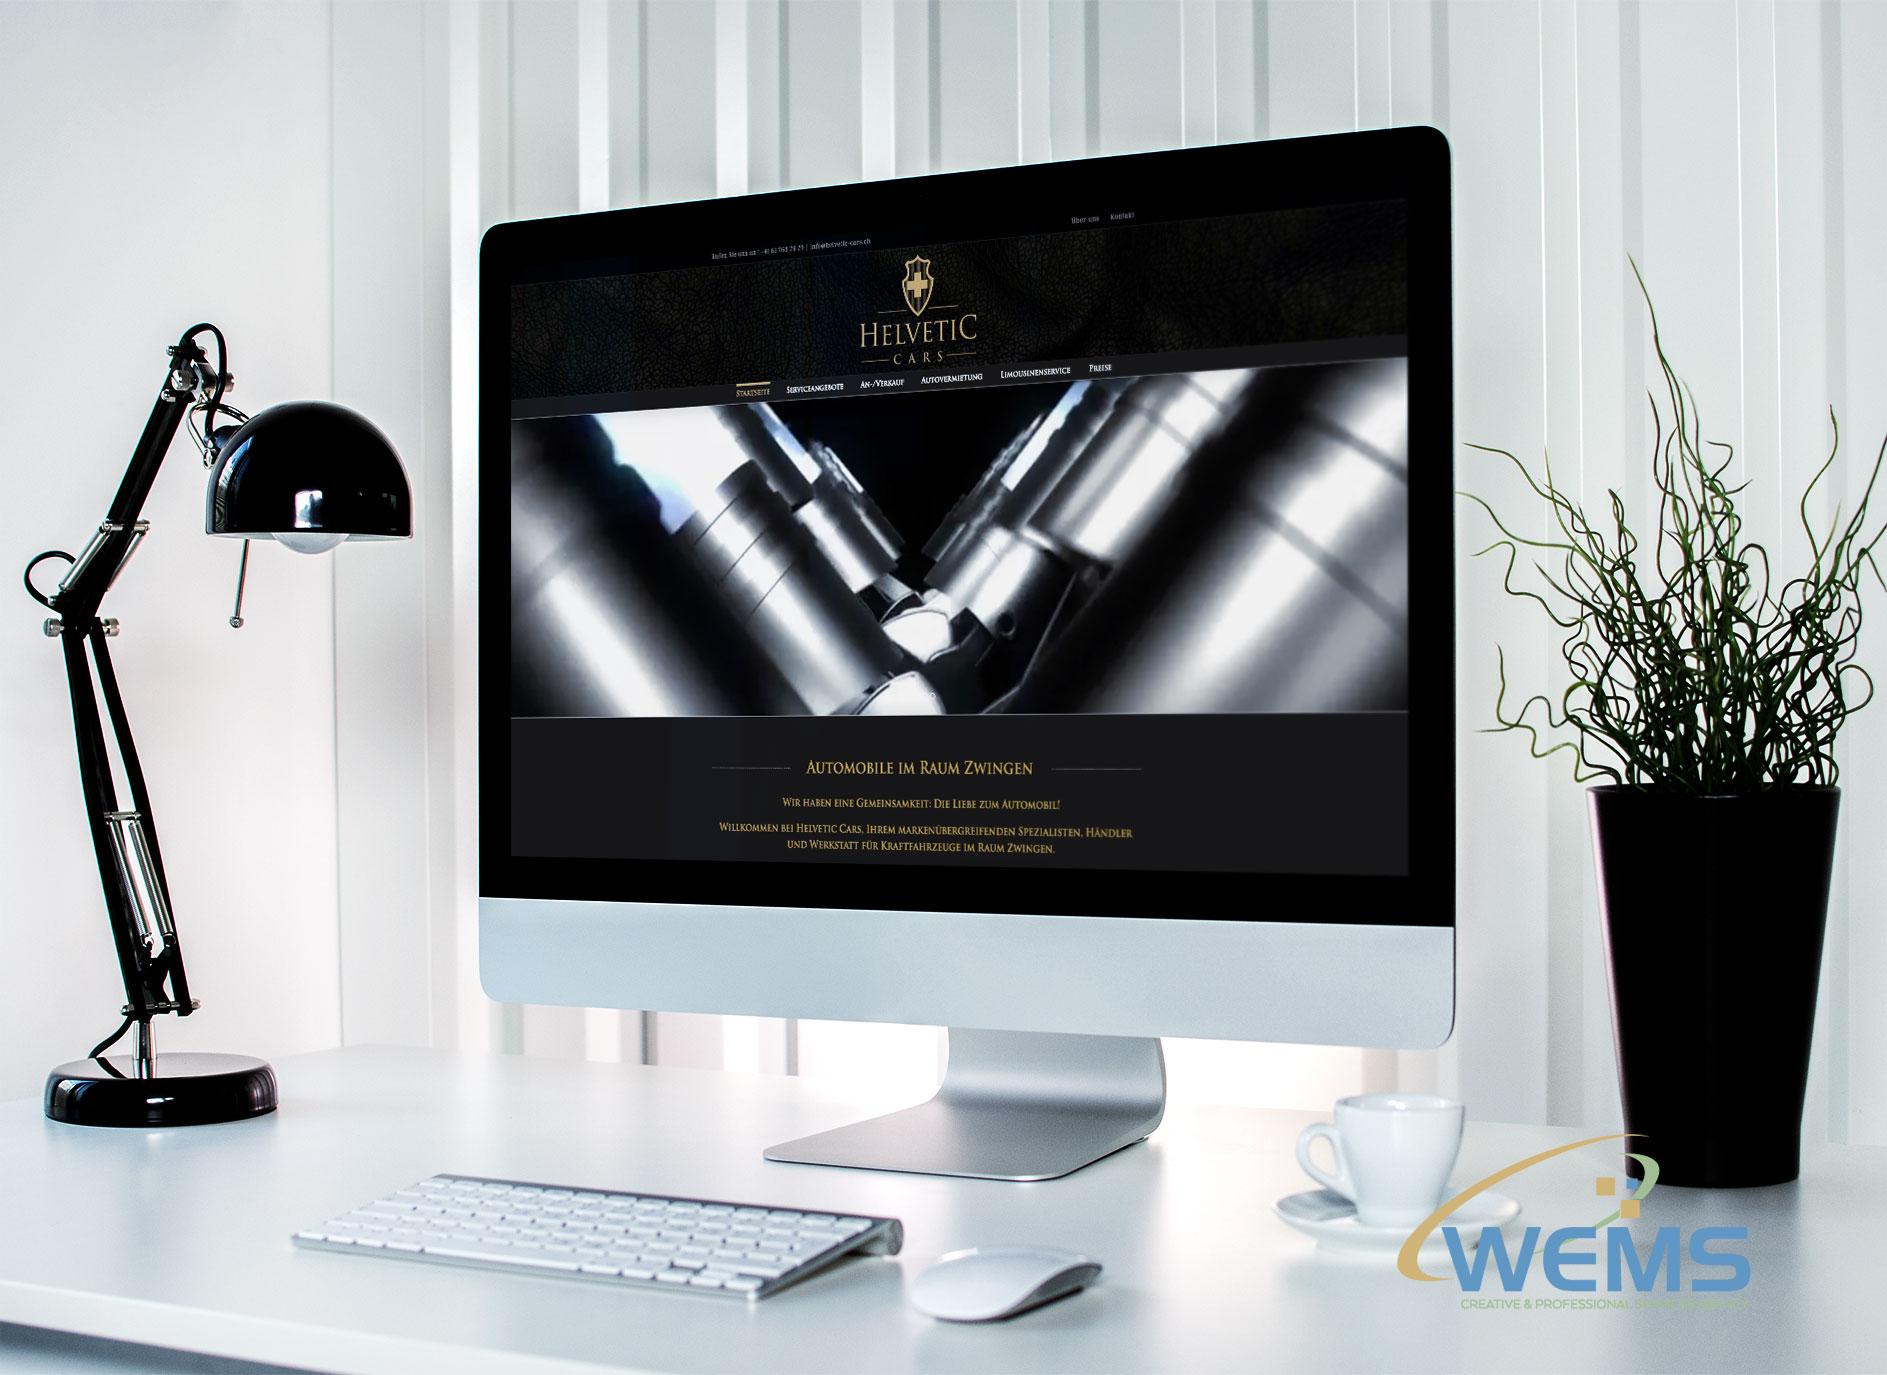 wems agency webdesign mockup helvetic cars - Webdesign und Suchmaschinenoptimierung (SEO) Agentur